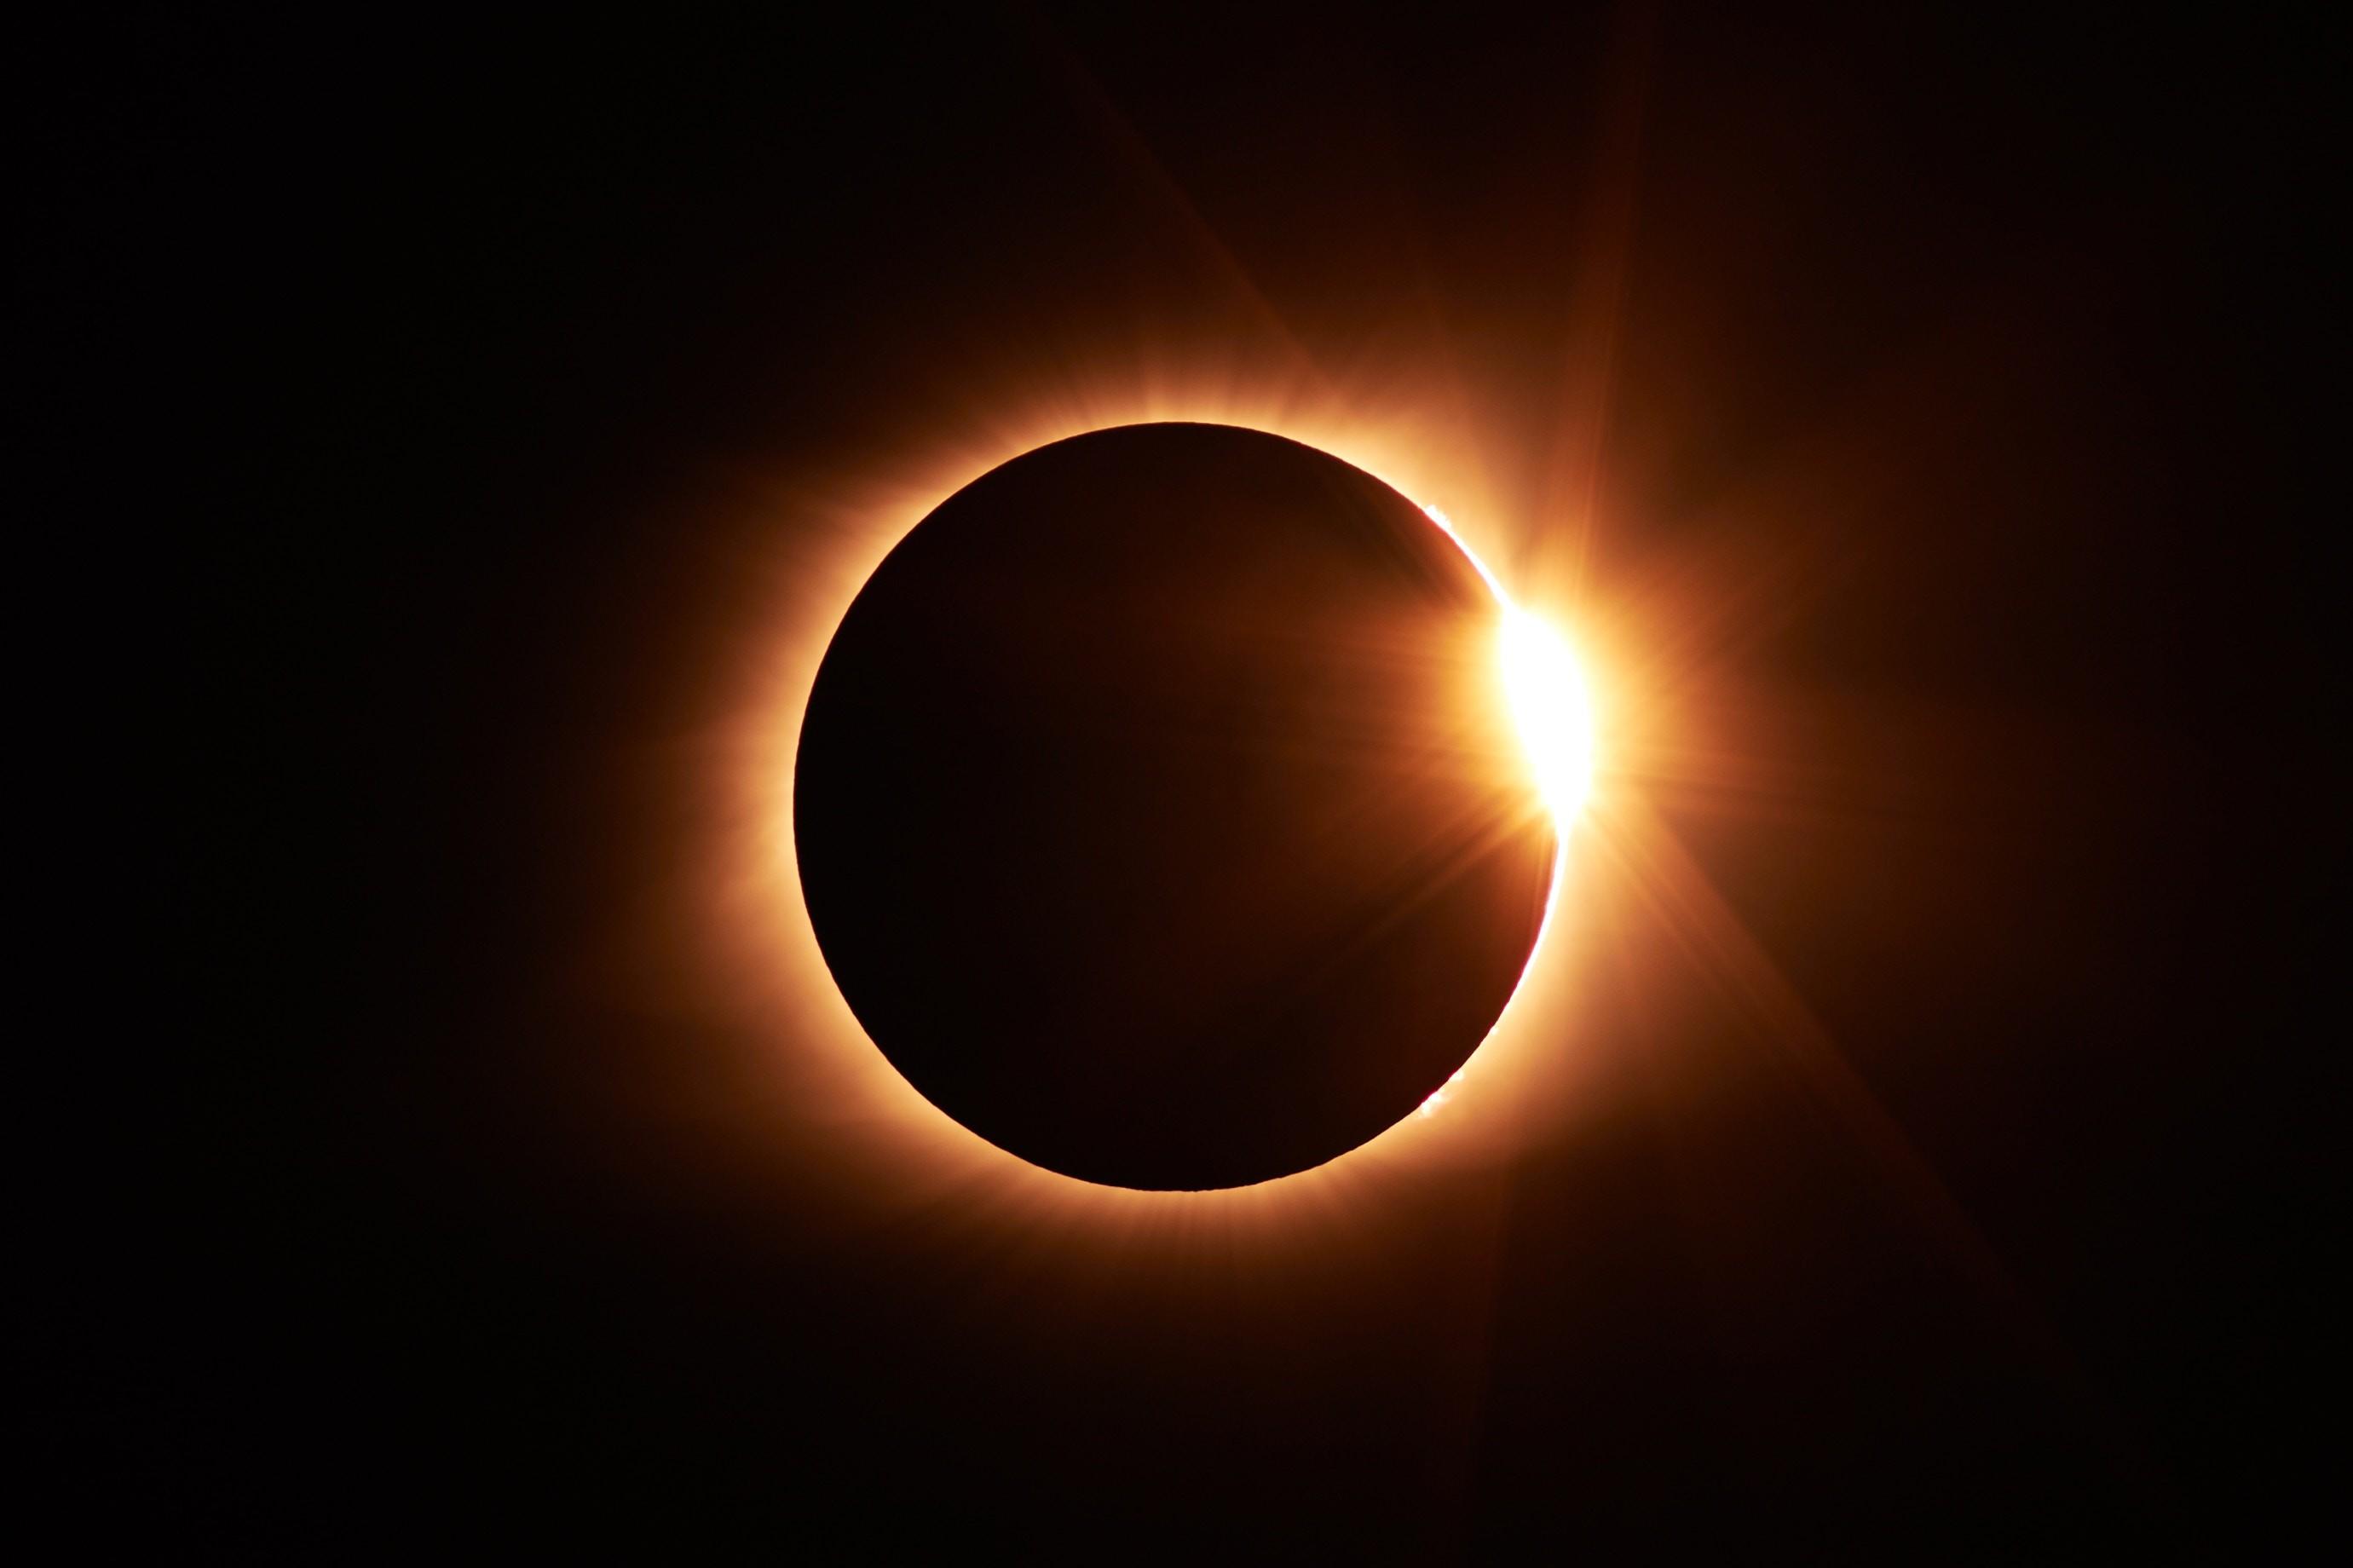 october 19 eclipse 2019 astrology